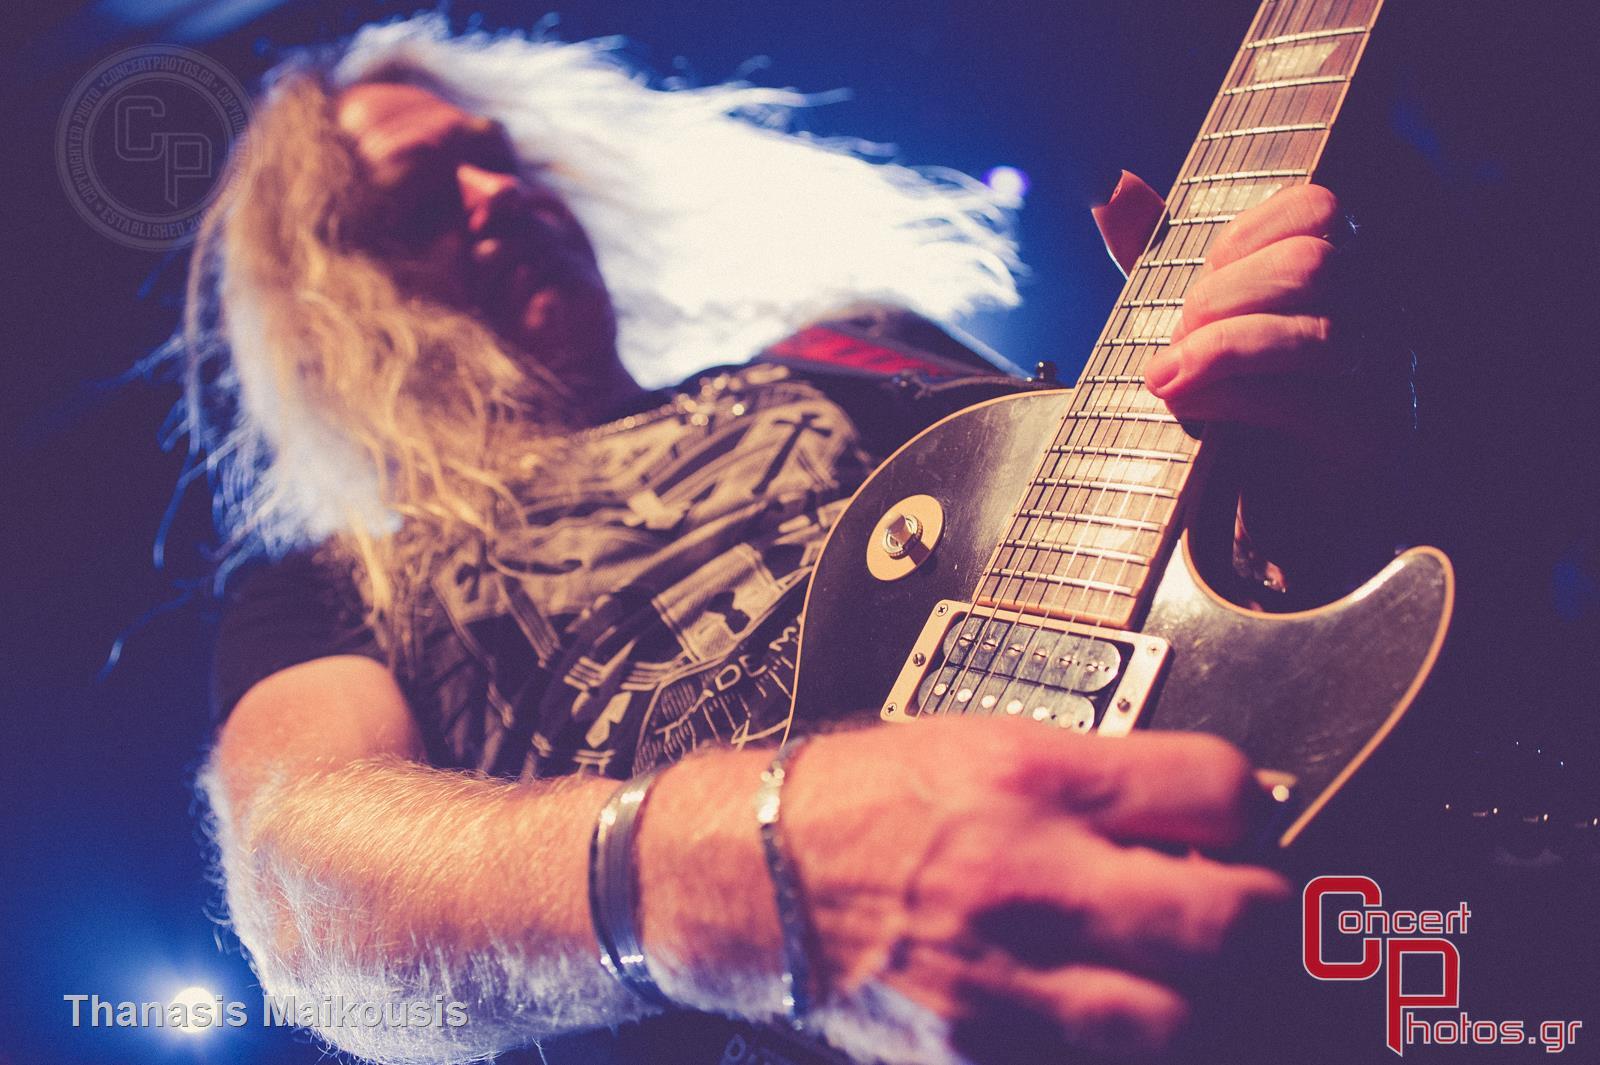 Saxon & Innerwish -Saxon Innerwish Gagarin photographer: Thanasis Maikousis - concertphotos_20141025_22_36_51